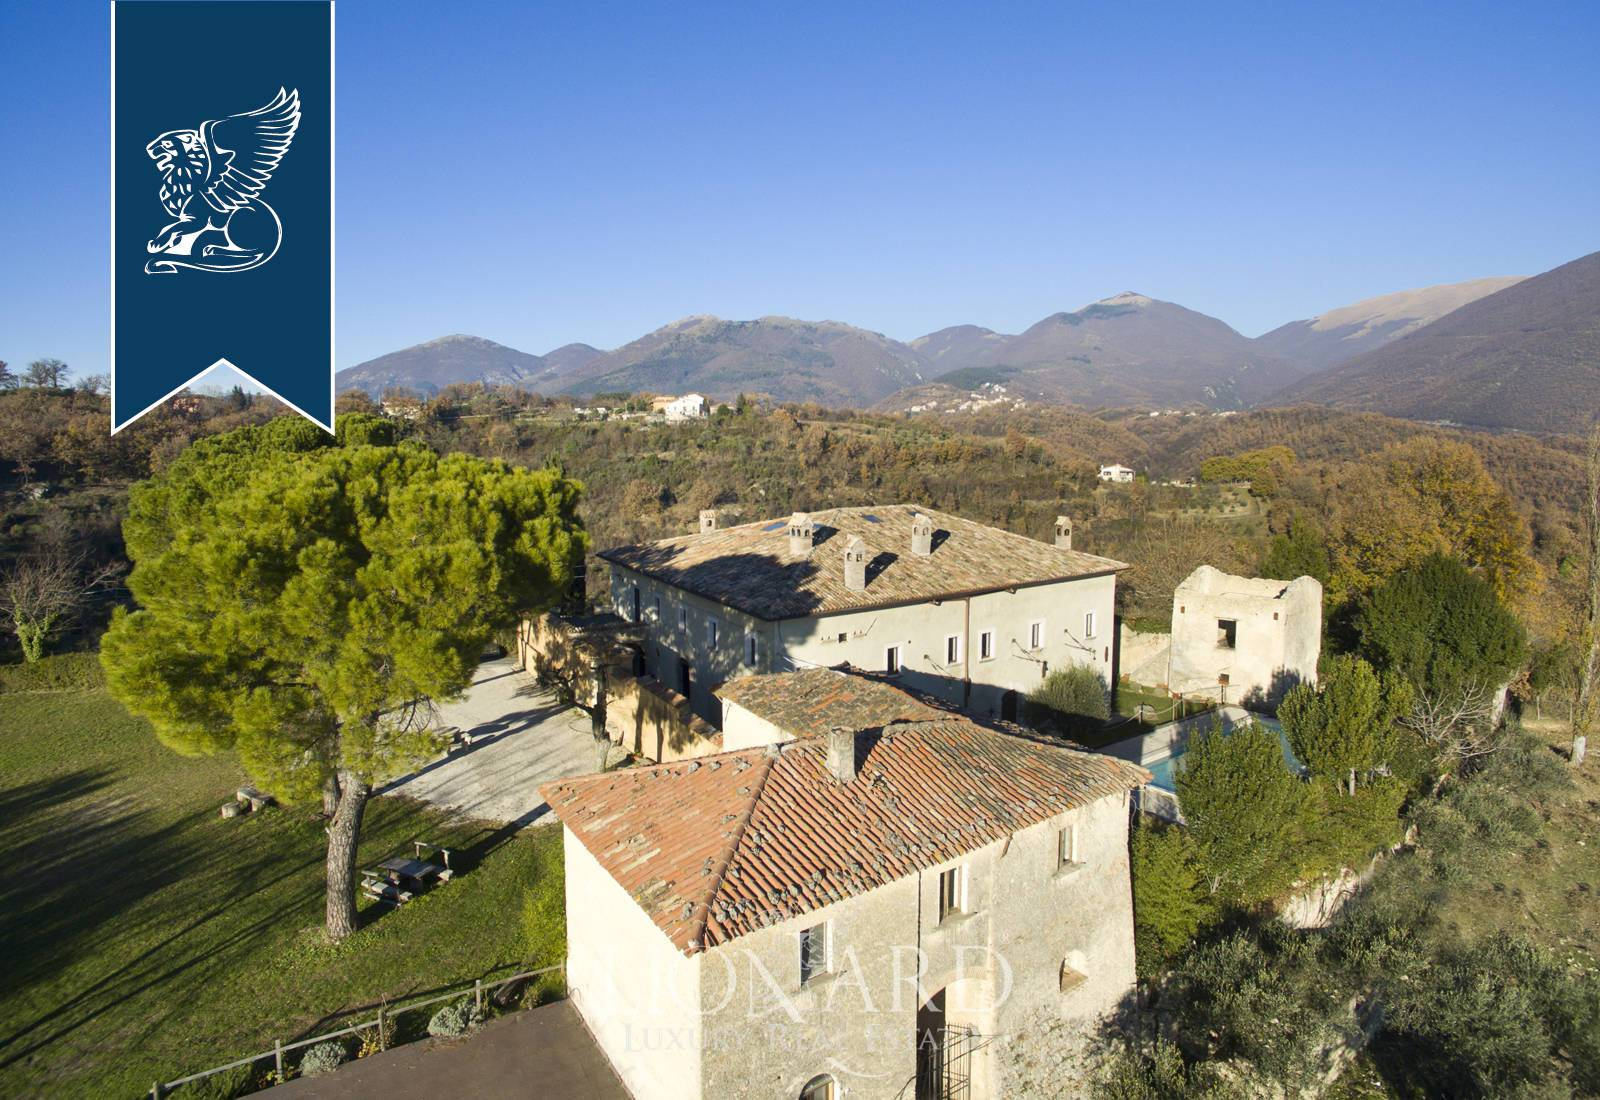 Agriturismo in Vendita a Cantalice: 0 locali, 600 mq - Foto 3